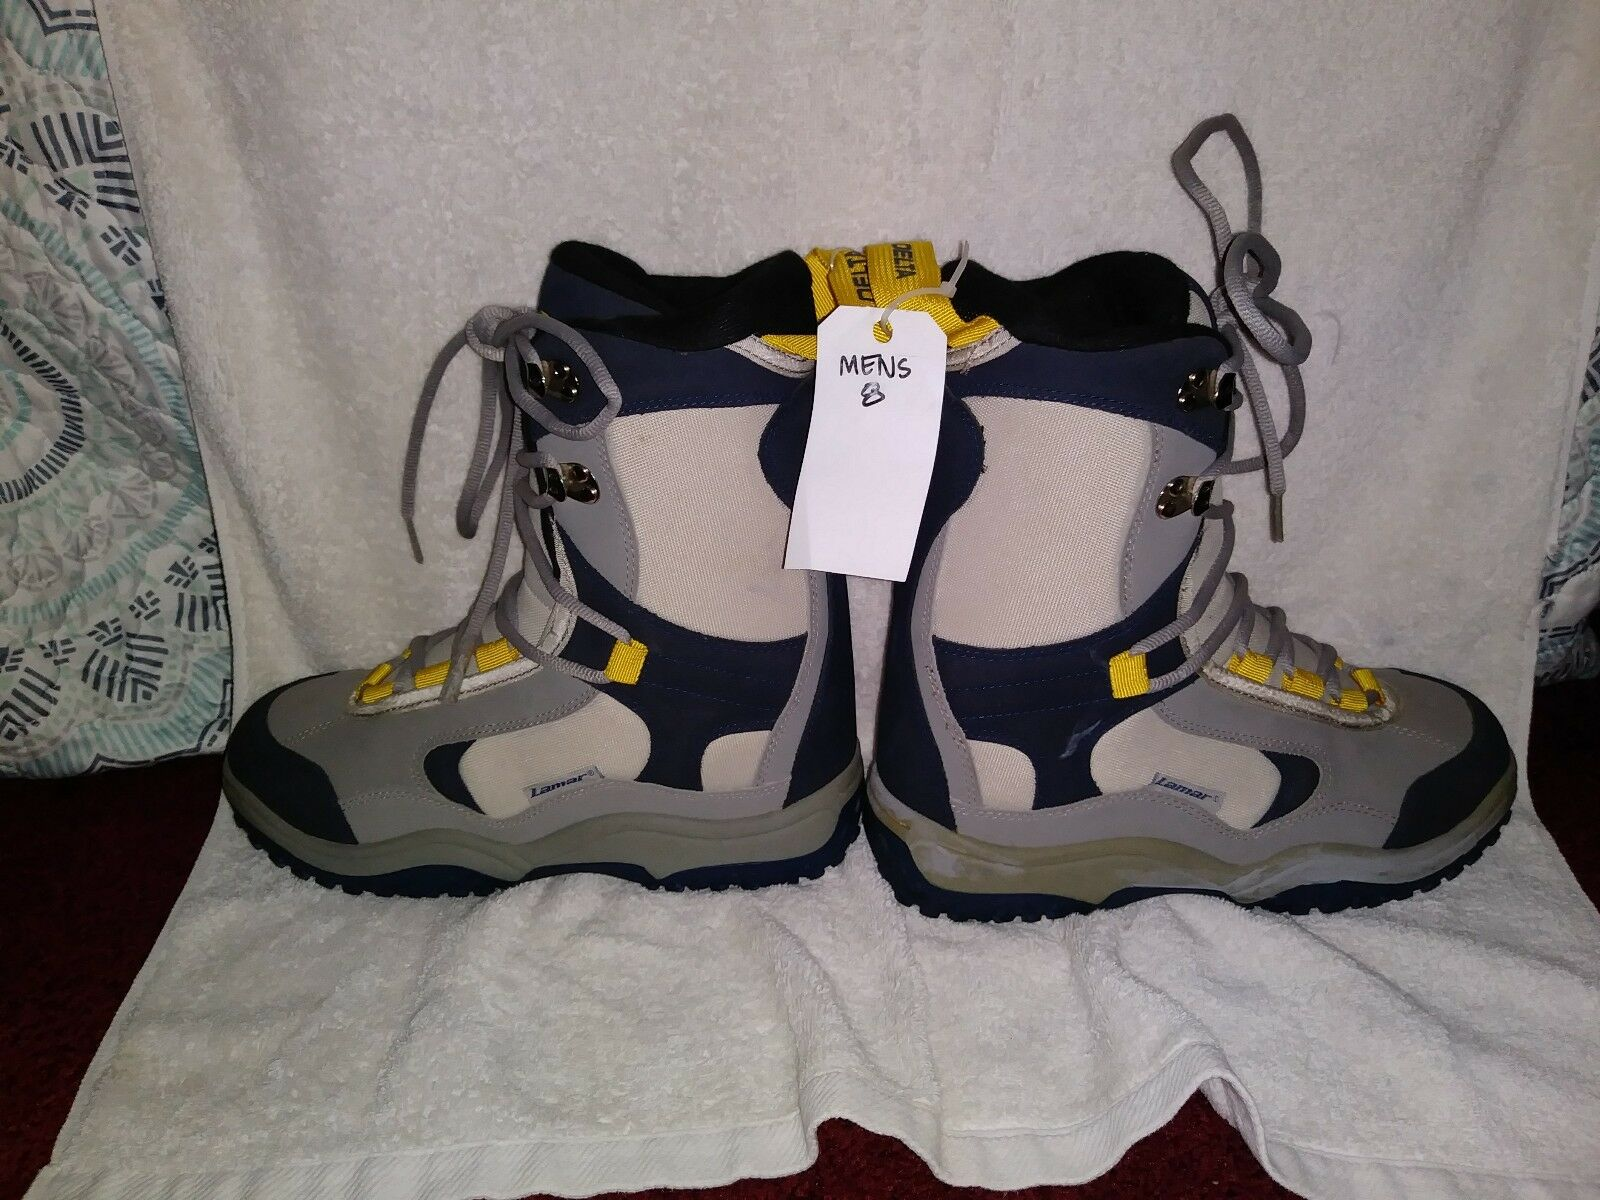 Lamar Delta Adult Linerless Snowboard Boots Size 8